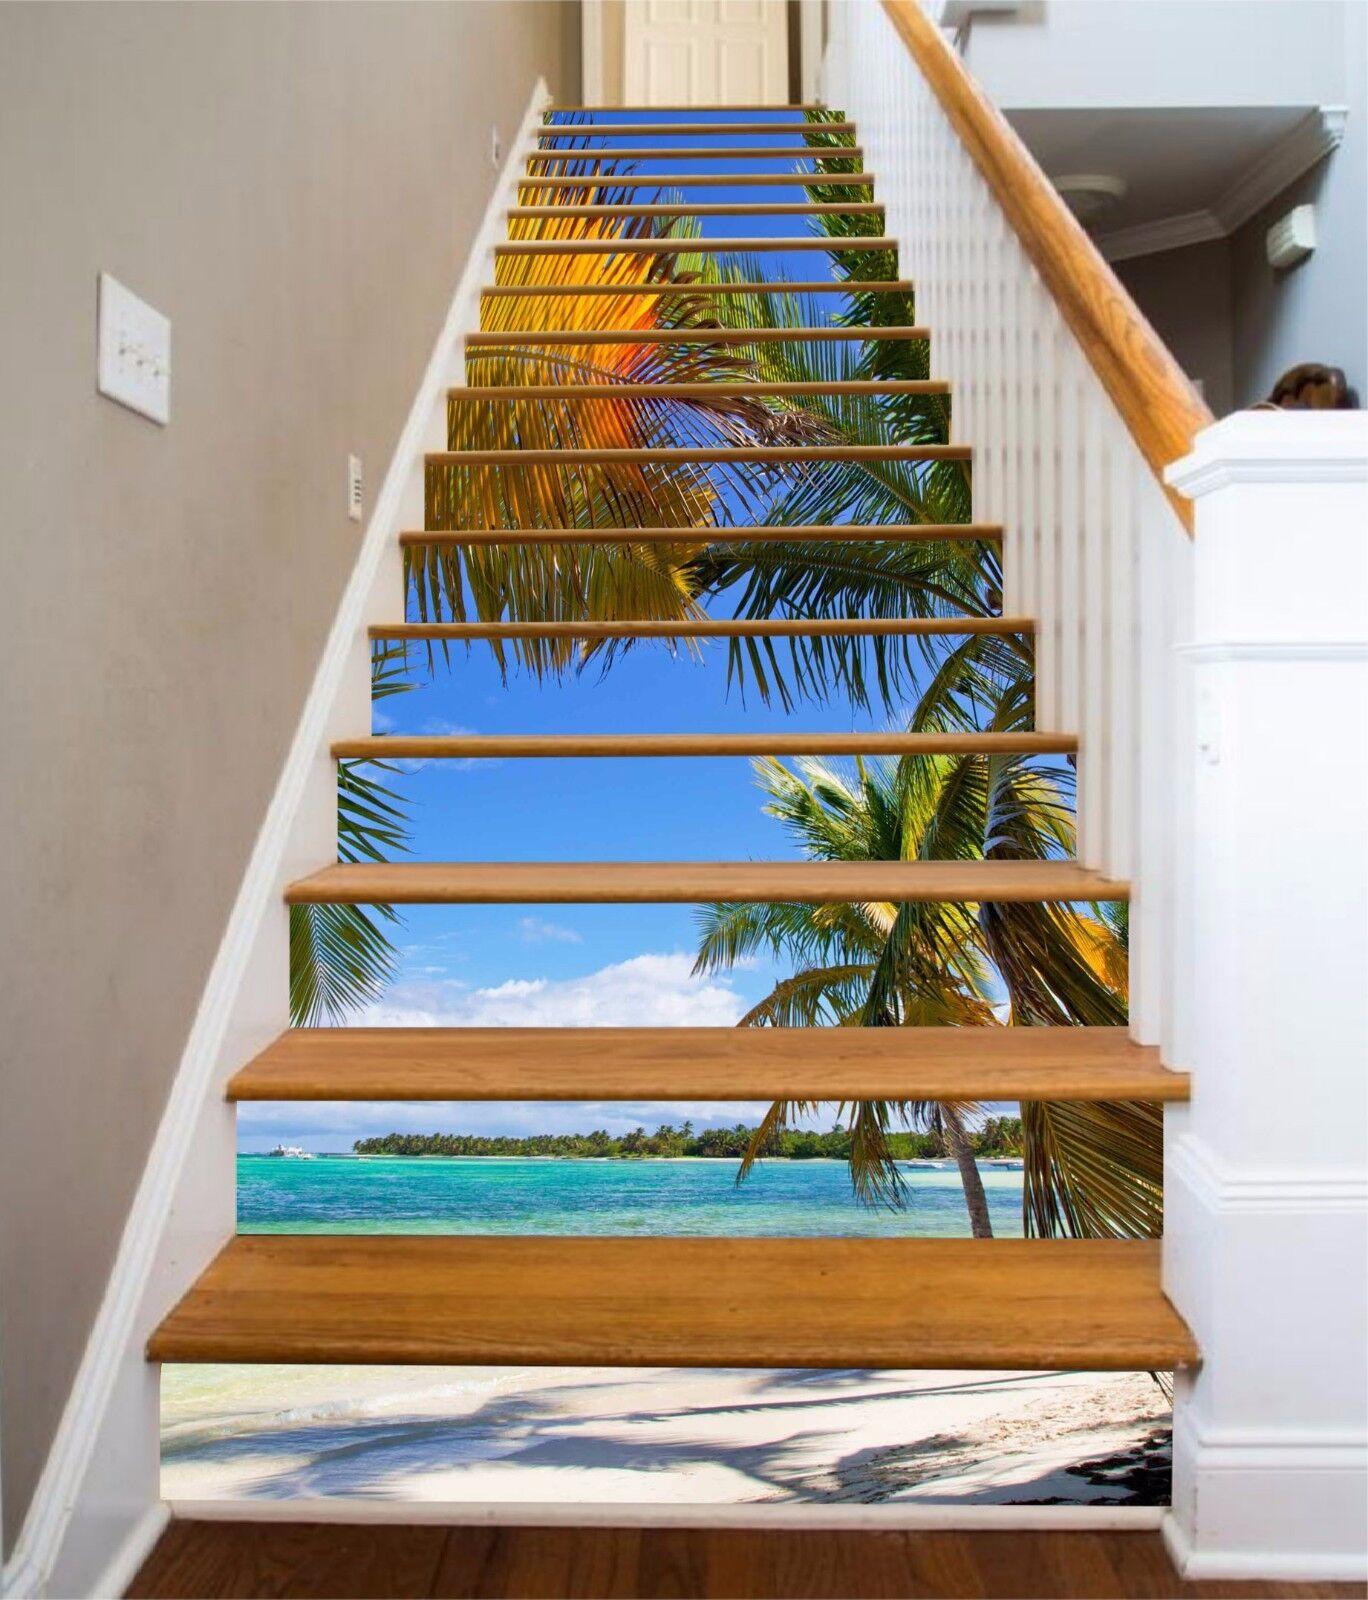 3D Palm Beach 7 Stair Risers Decoration Photo Mural Vinyl Decal Wallpaper UK